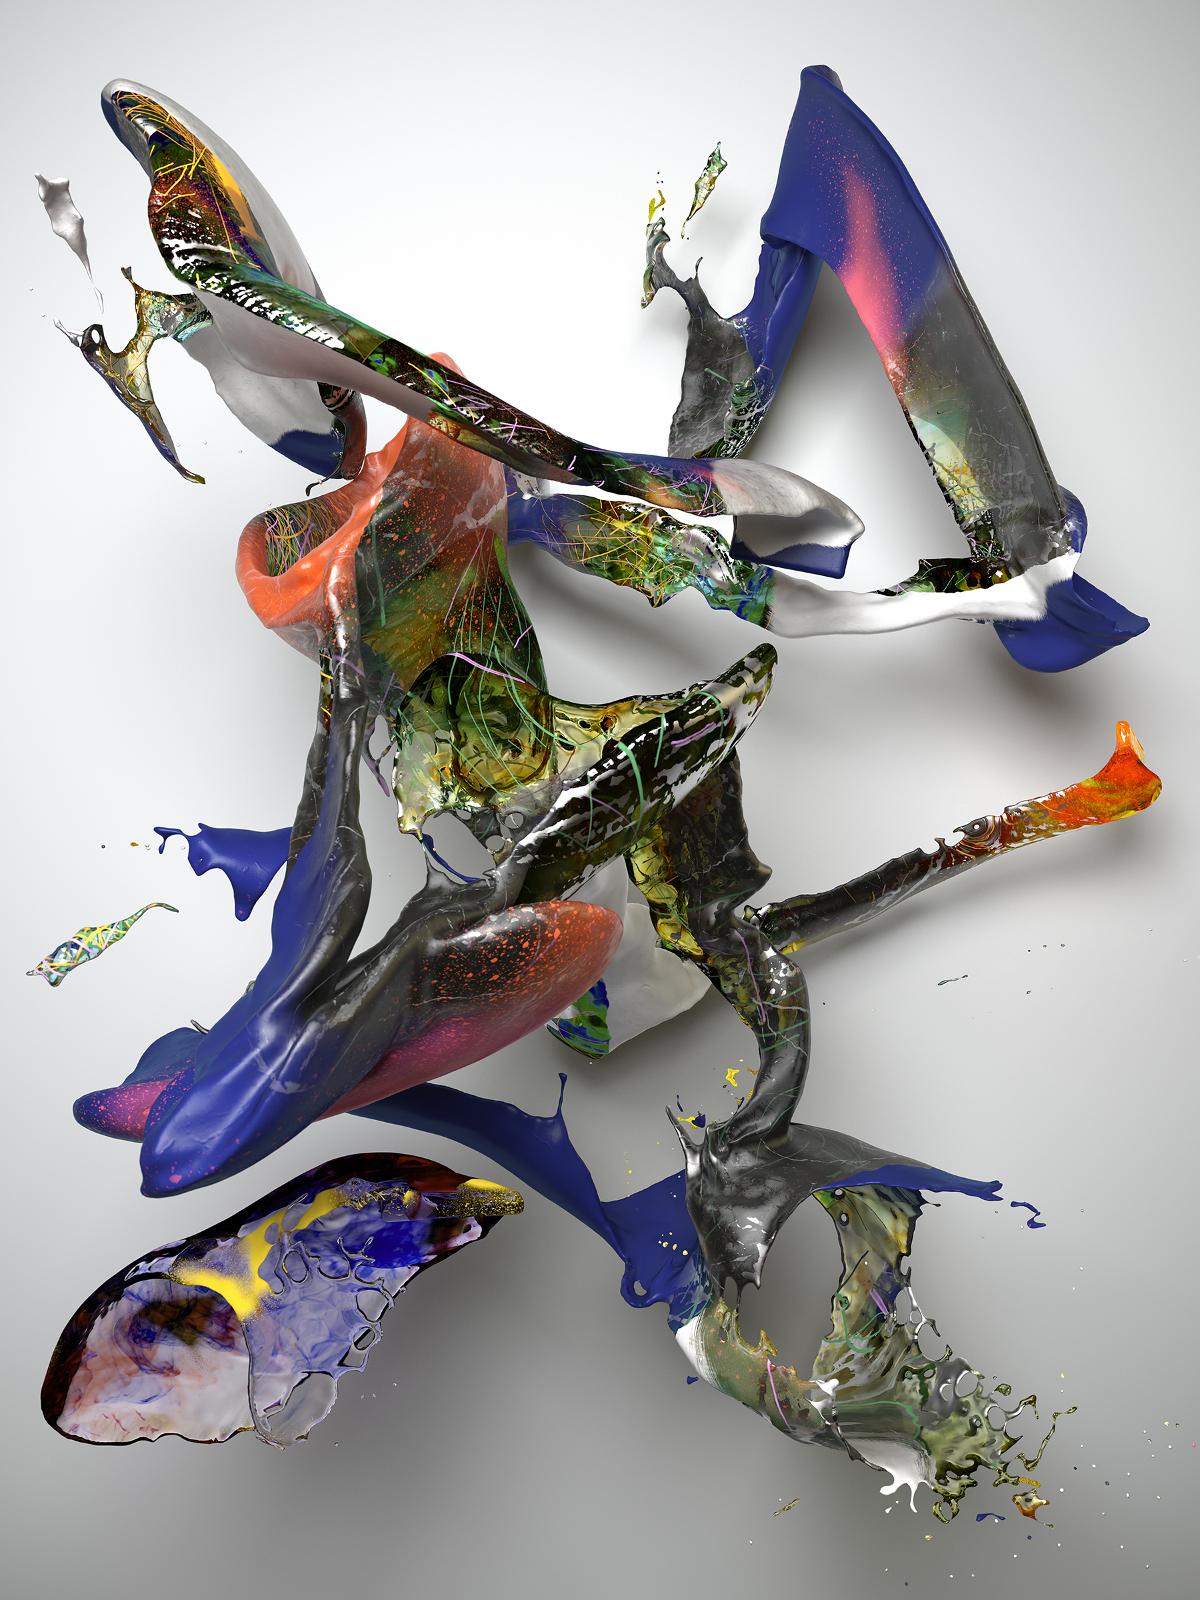 Banz & Bowinkel, Substance I-1, CGI Fine Art Print, 200 cm x 150 cm, 2017